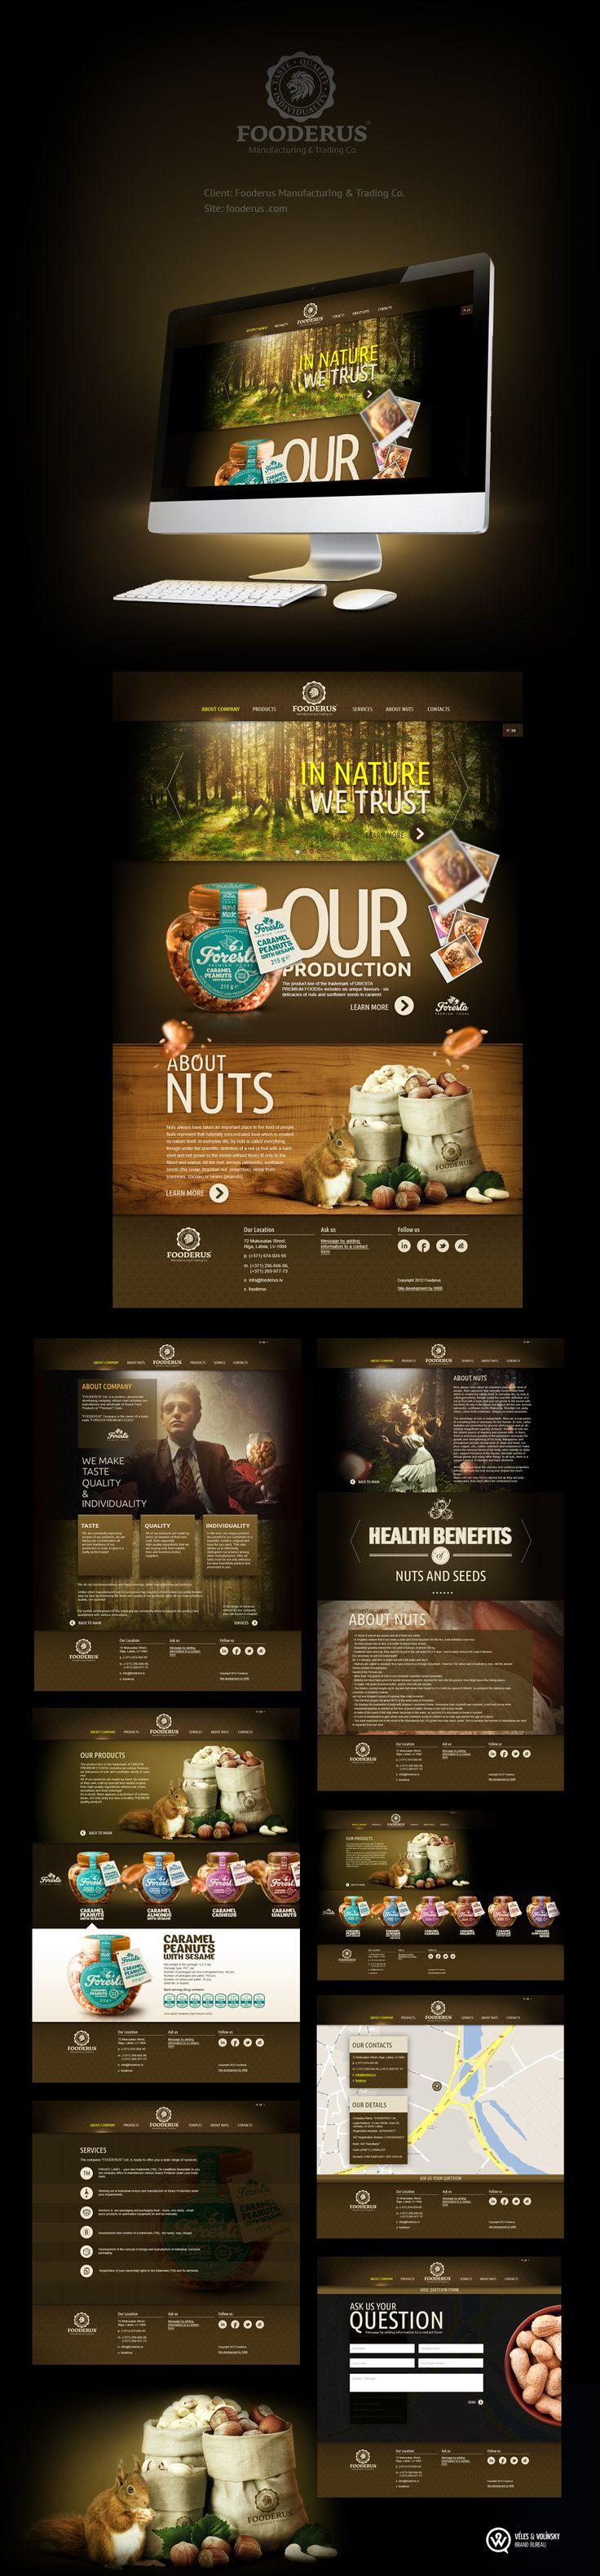 Fooderus website layout and design #webdesigninspiresmetobebetter